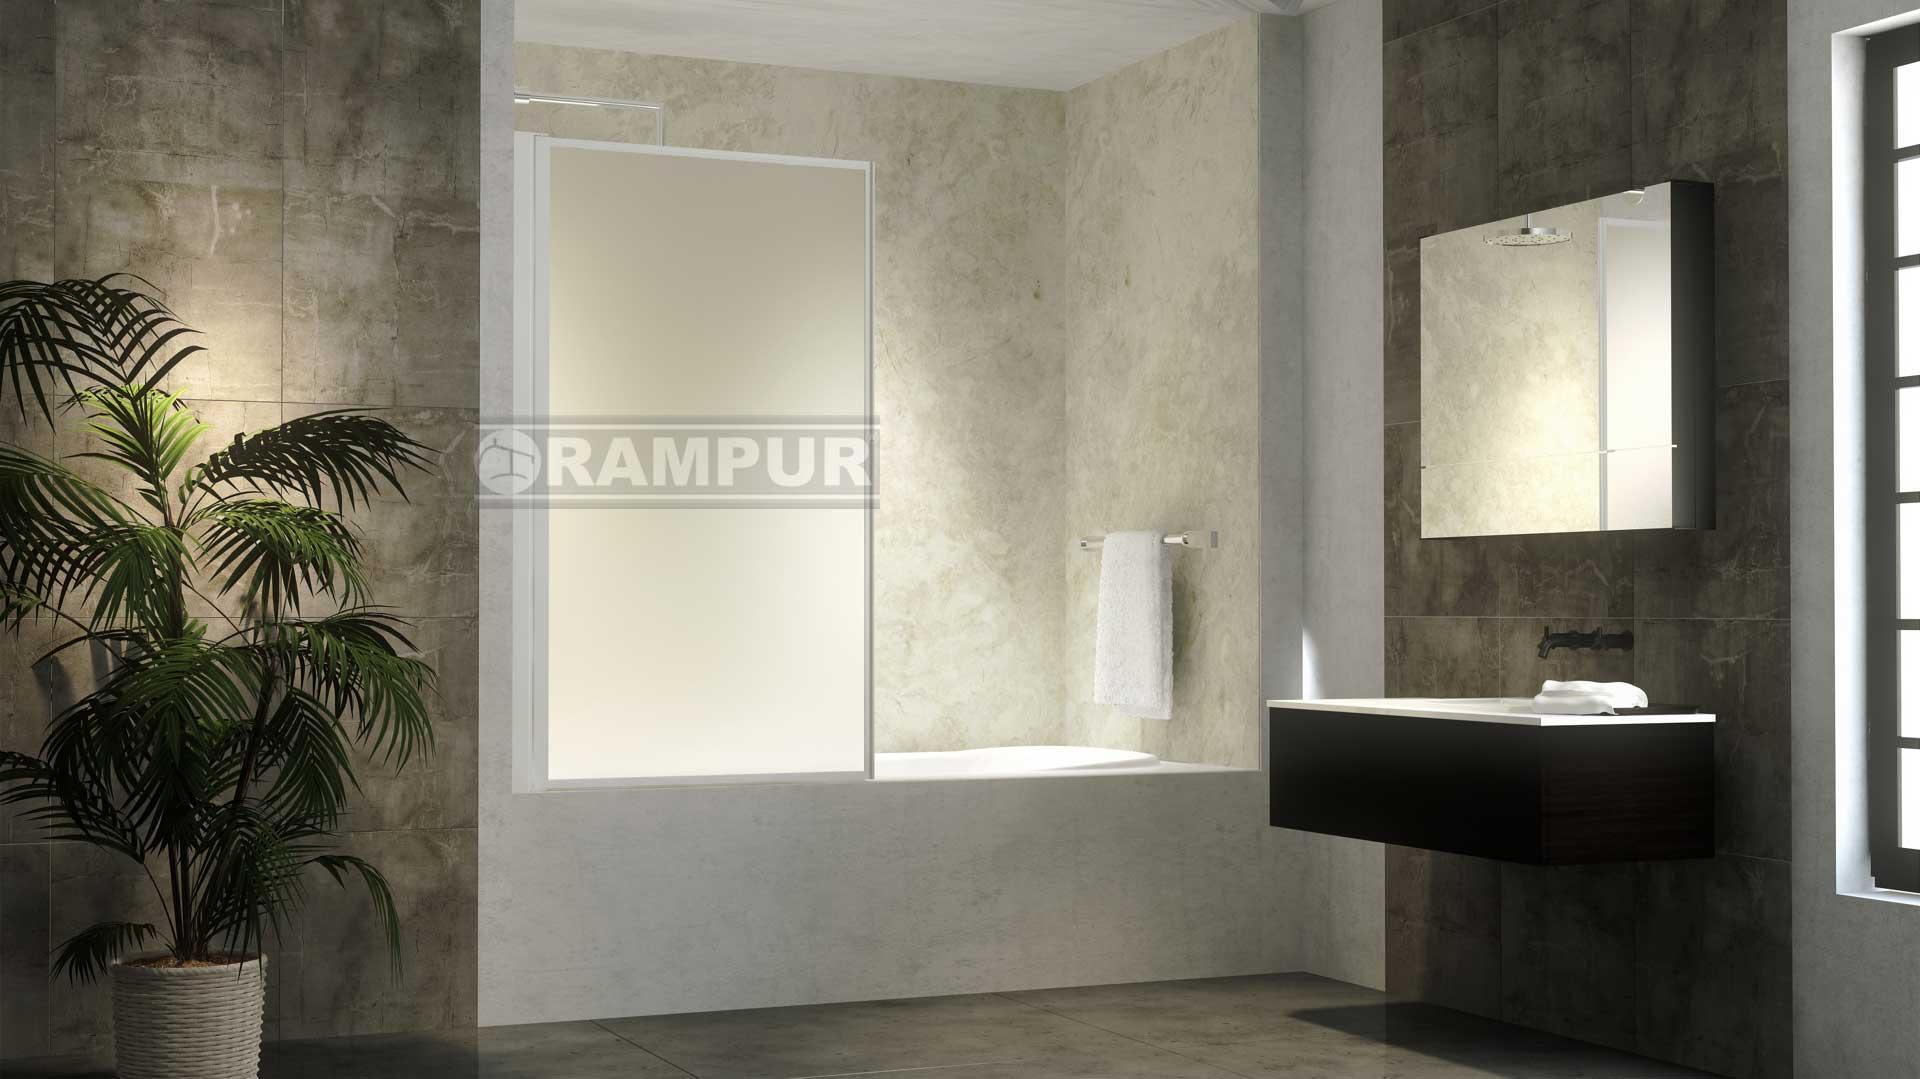 Mamparas Para Baño Rampur:Mamparas Rebatibles Para Baño – Acrílico – Andes Premium